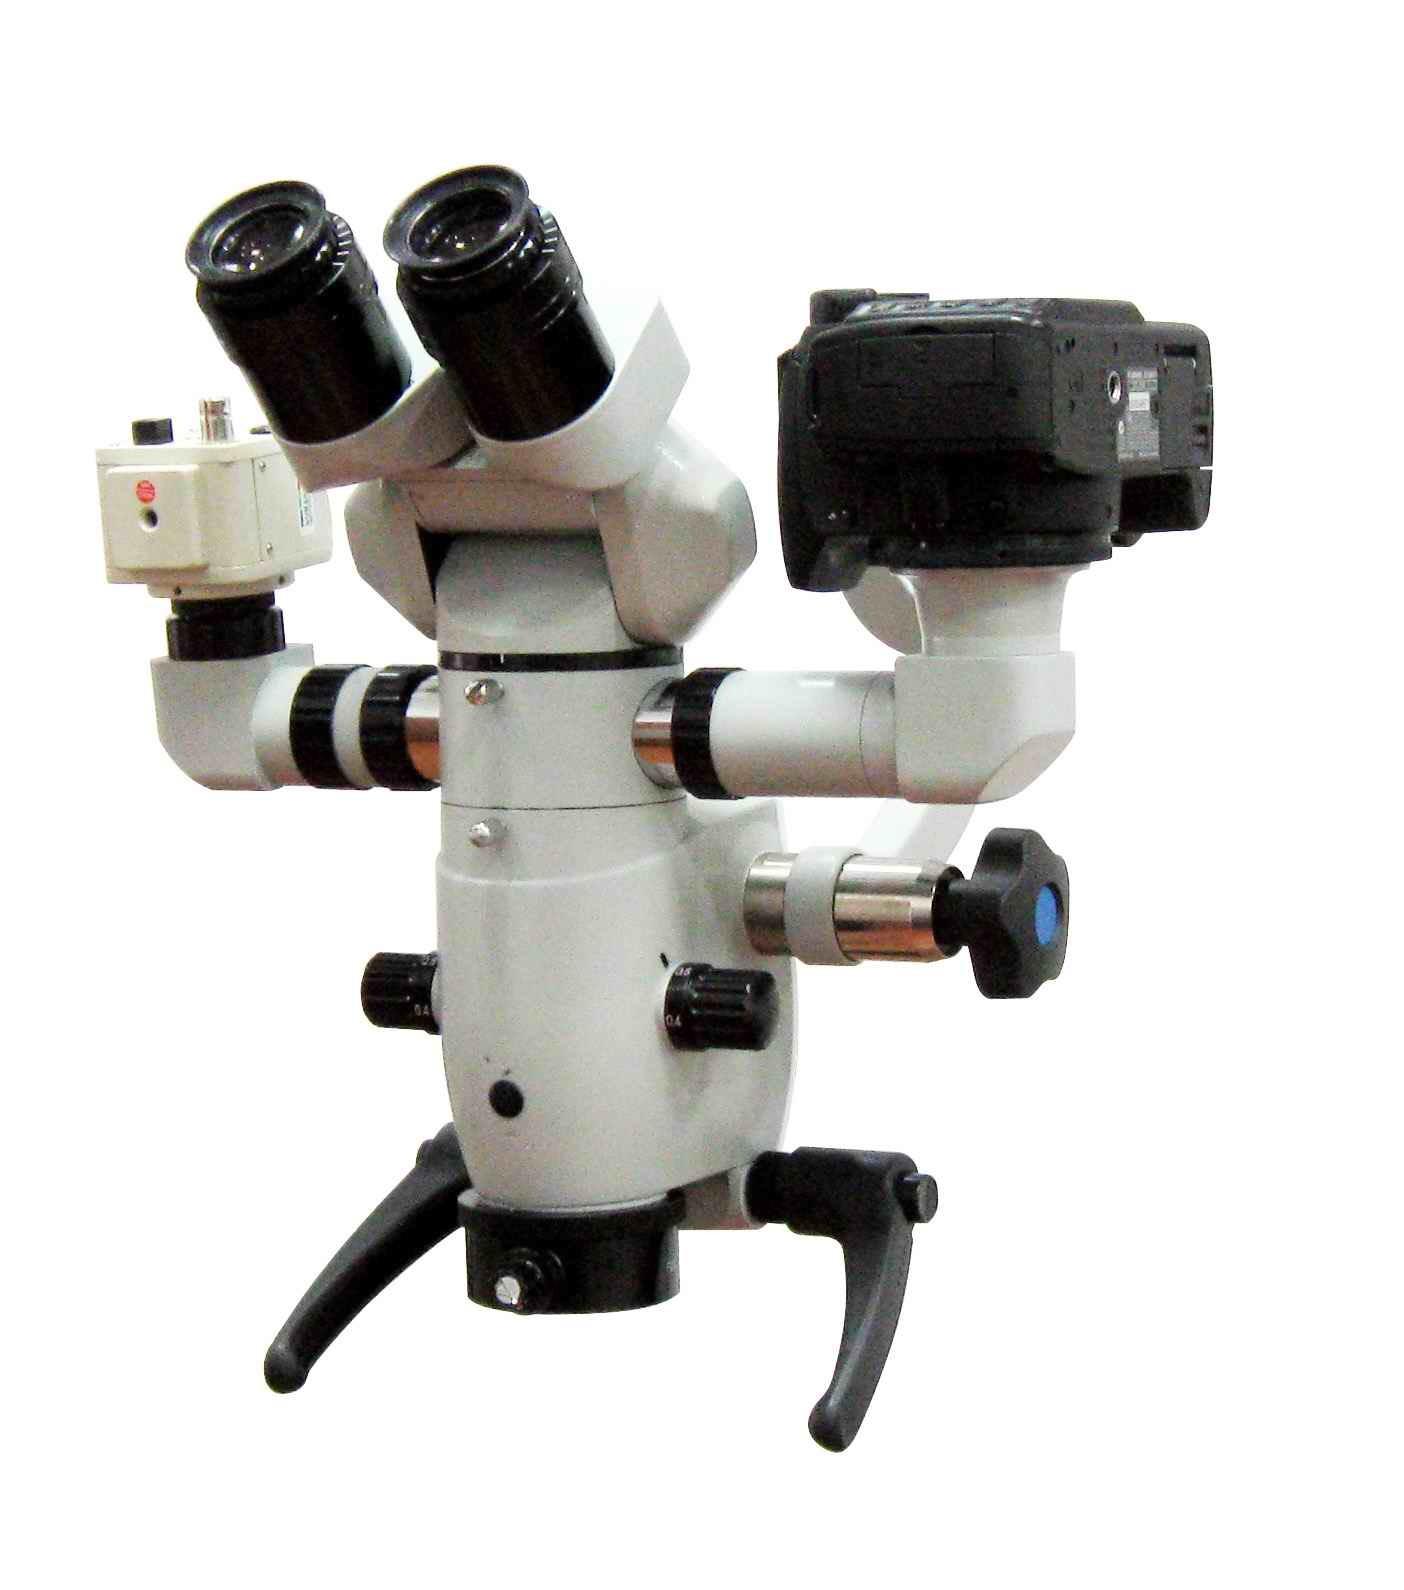 Microscope Video Camera (OMS2300)